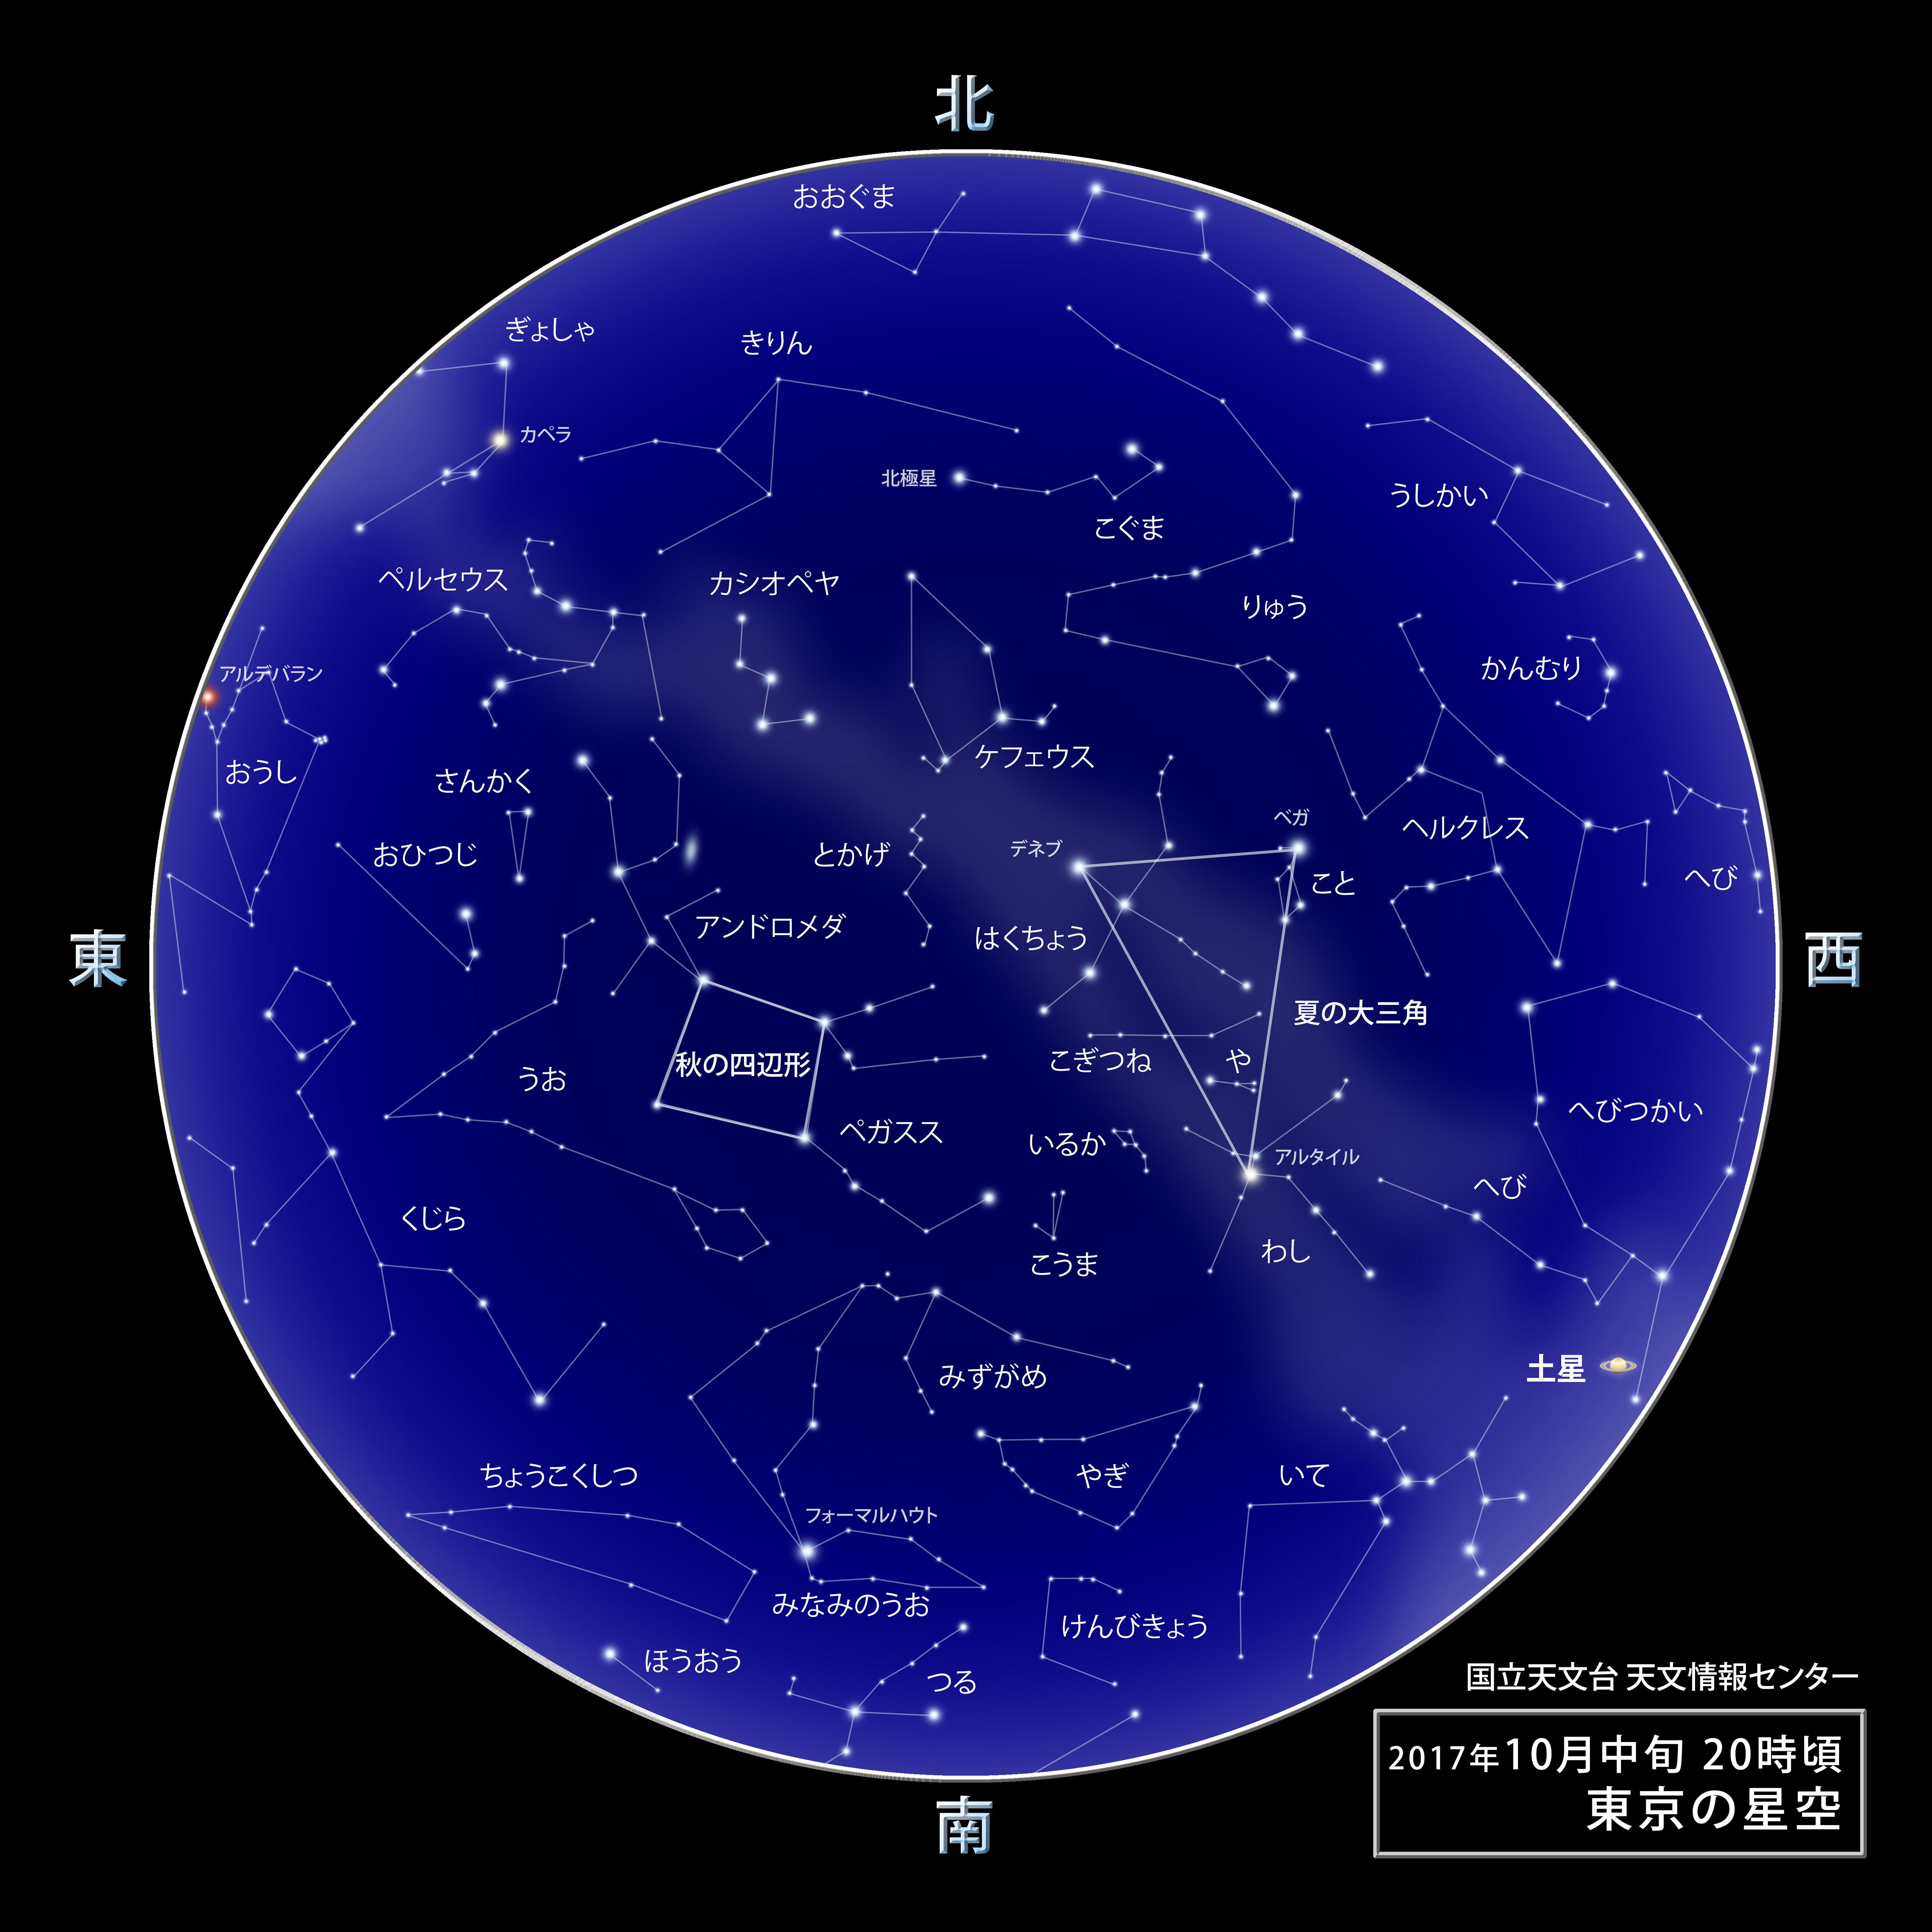 自然科学研究機構 国立天文台東京の星空・カレンダー・惑星(2017年10月)